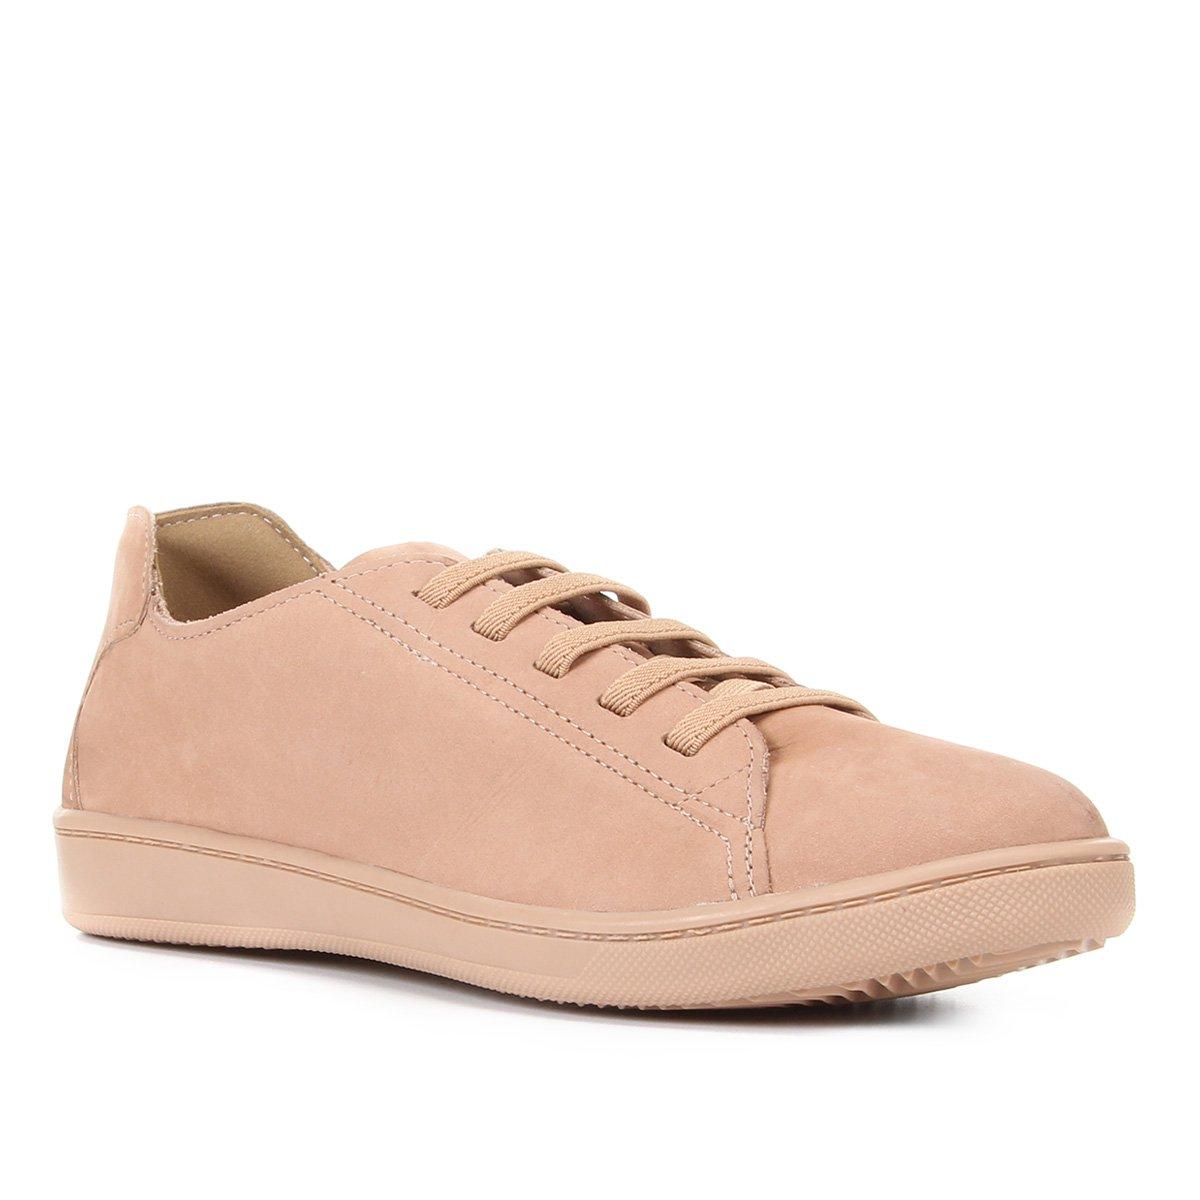 Tênis Couro Shoestock Nobuck Comfort Elástico Feminino